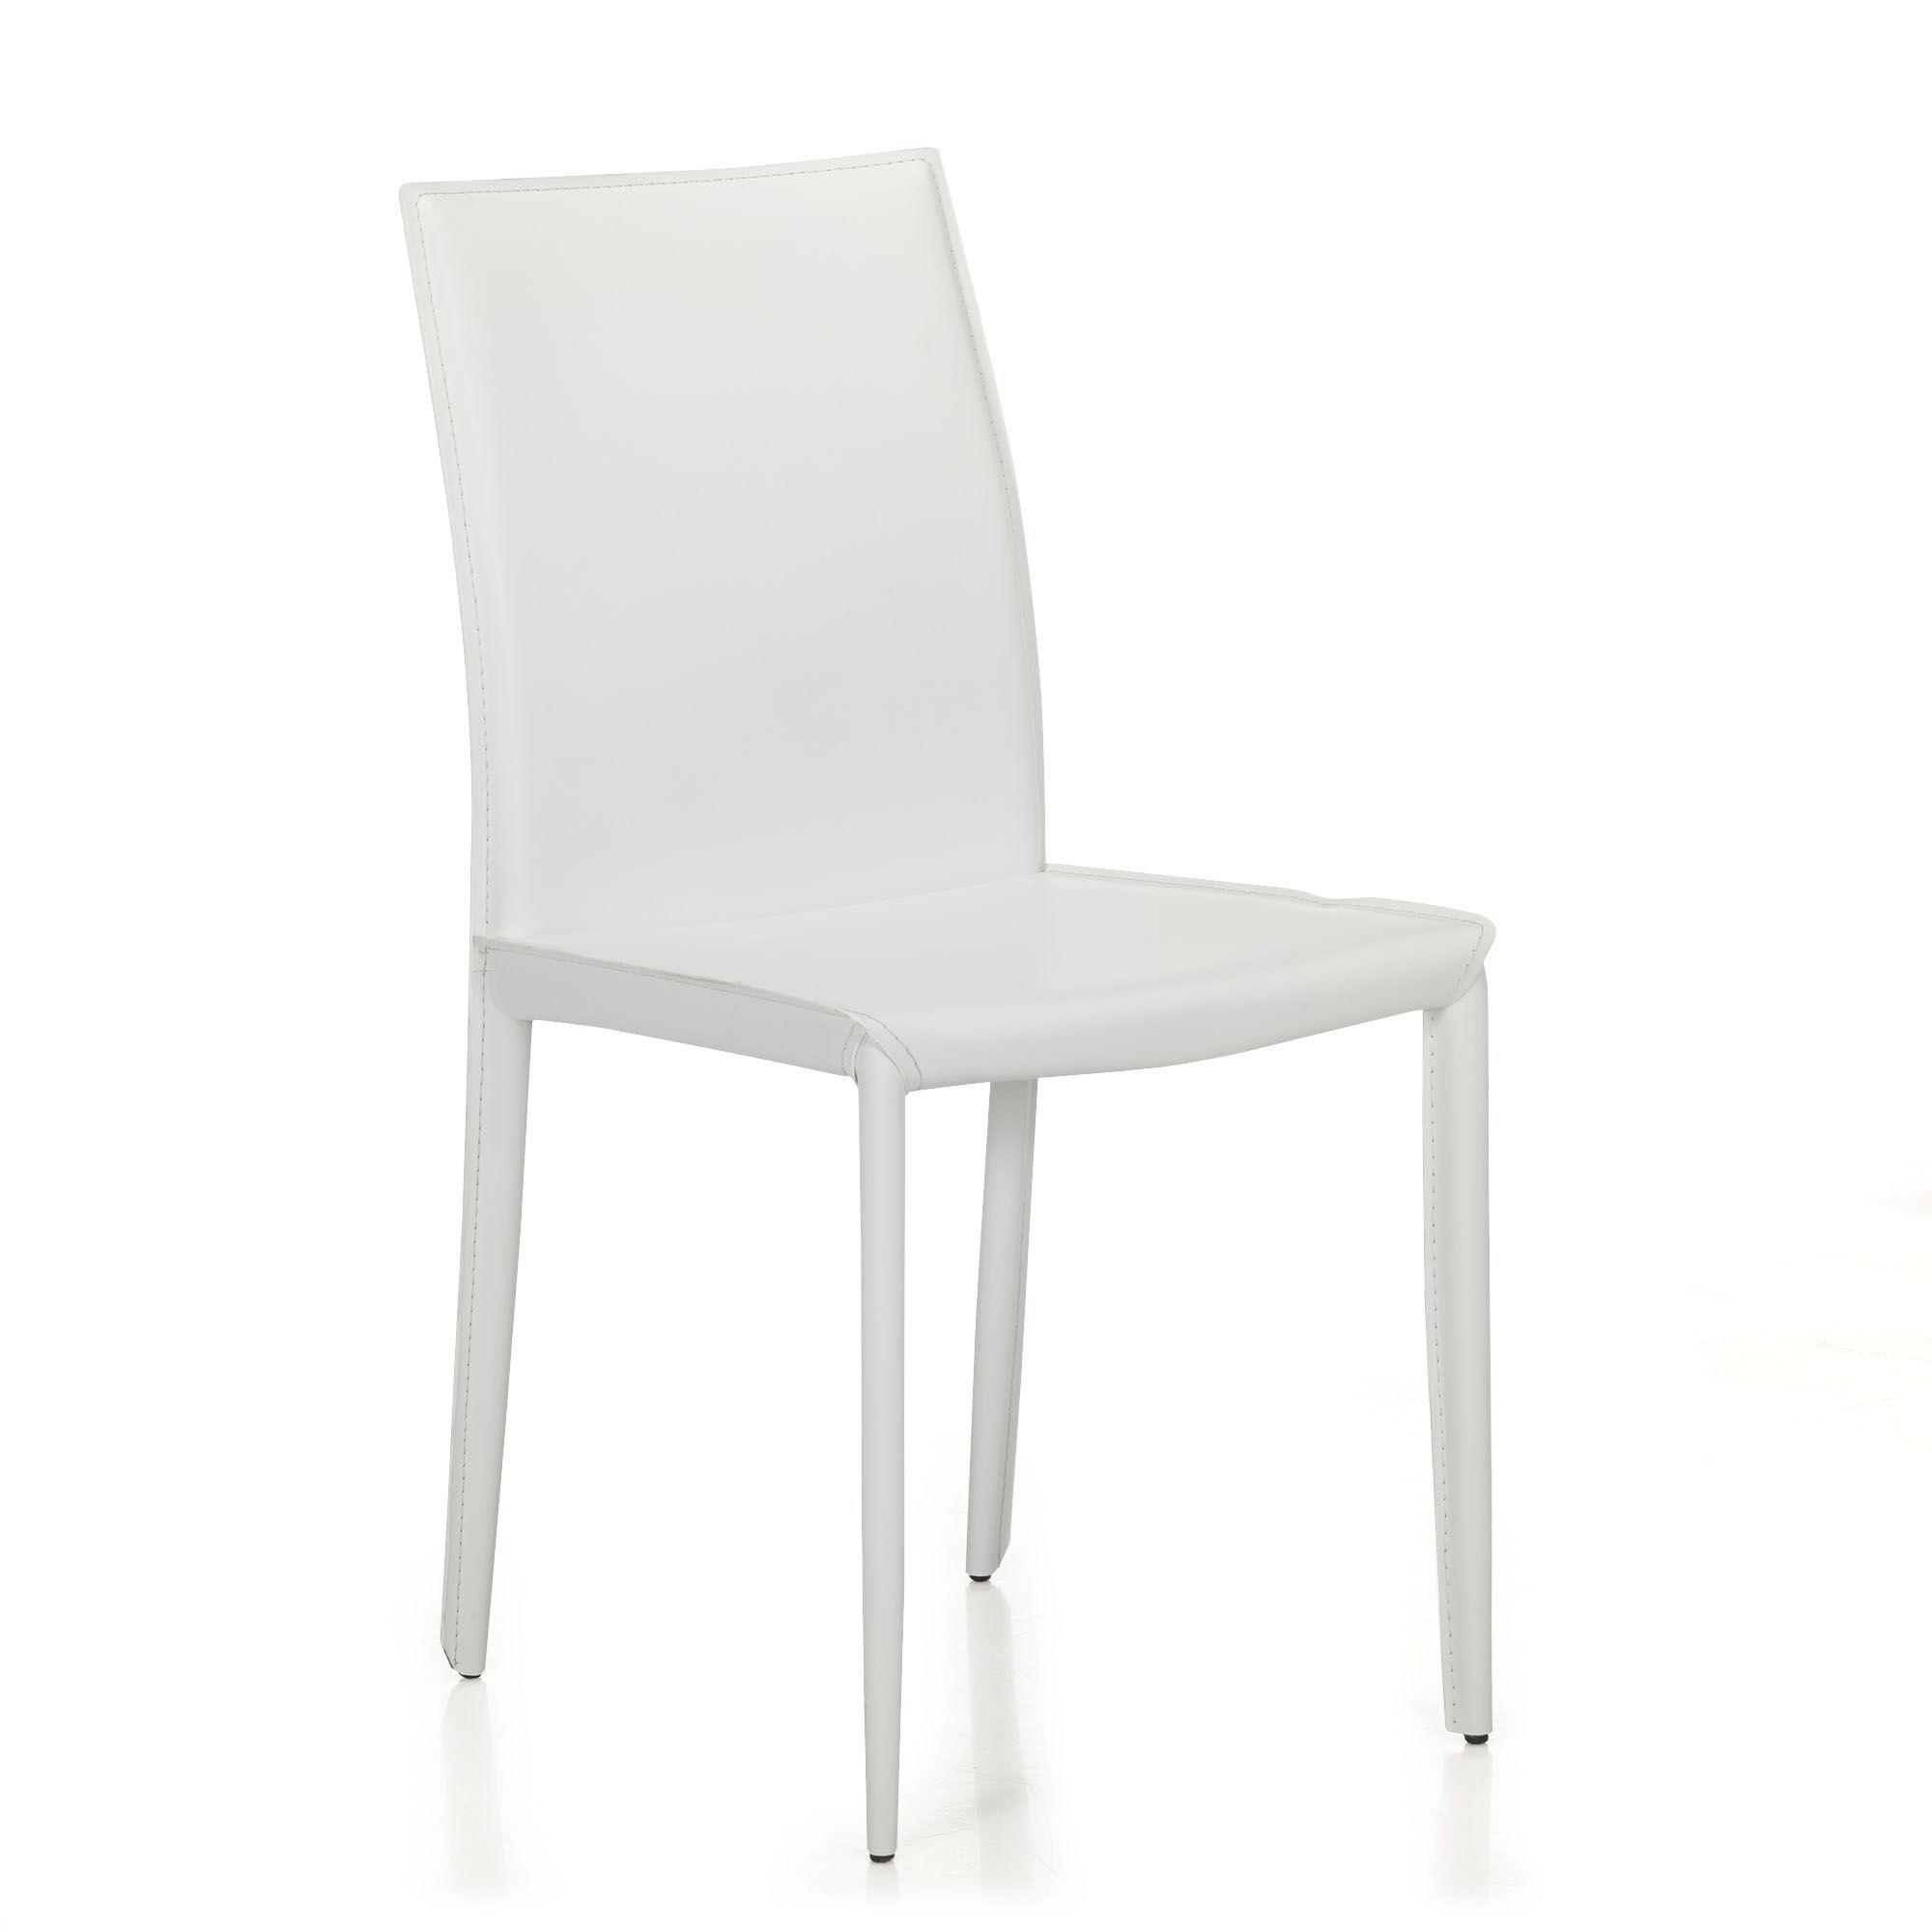 Chaise En Crote De Cuir Blanche Blanc